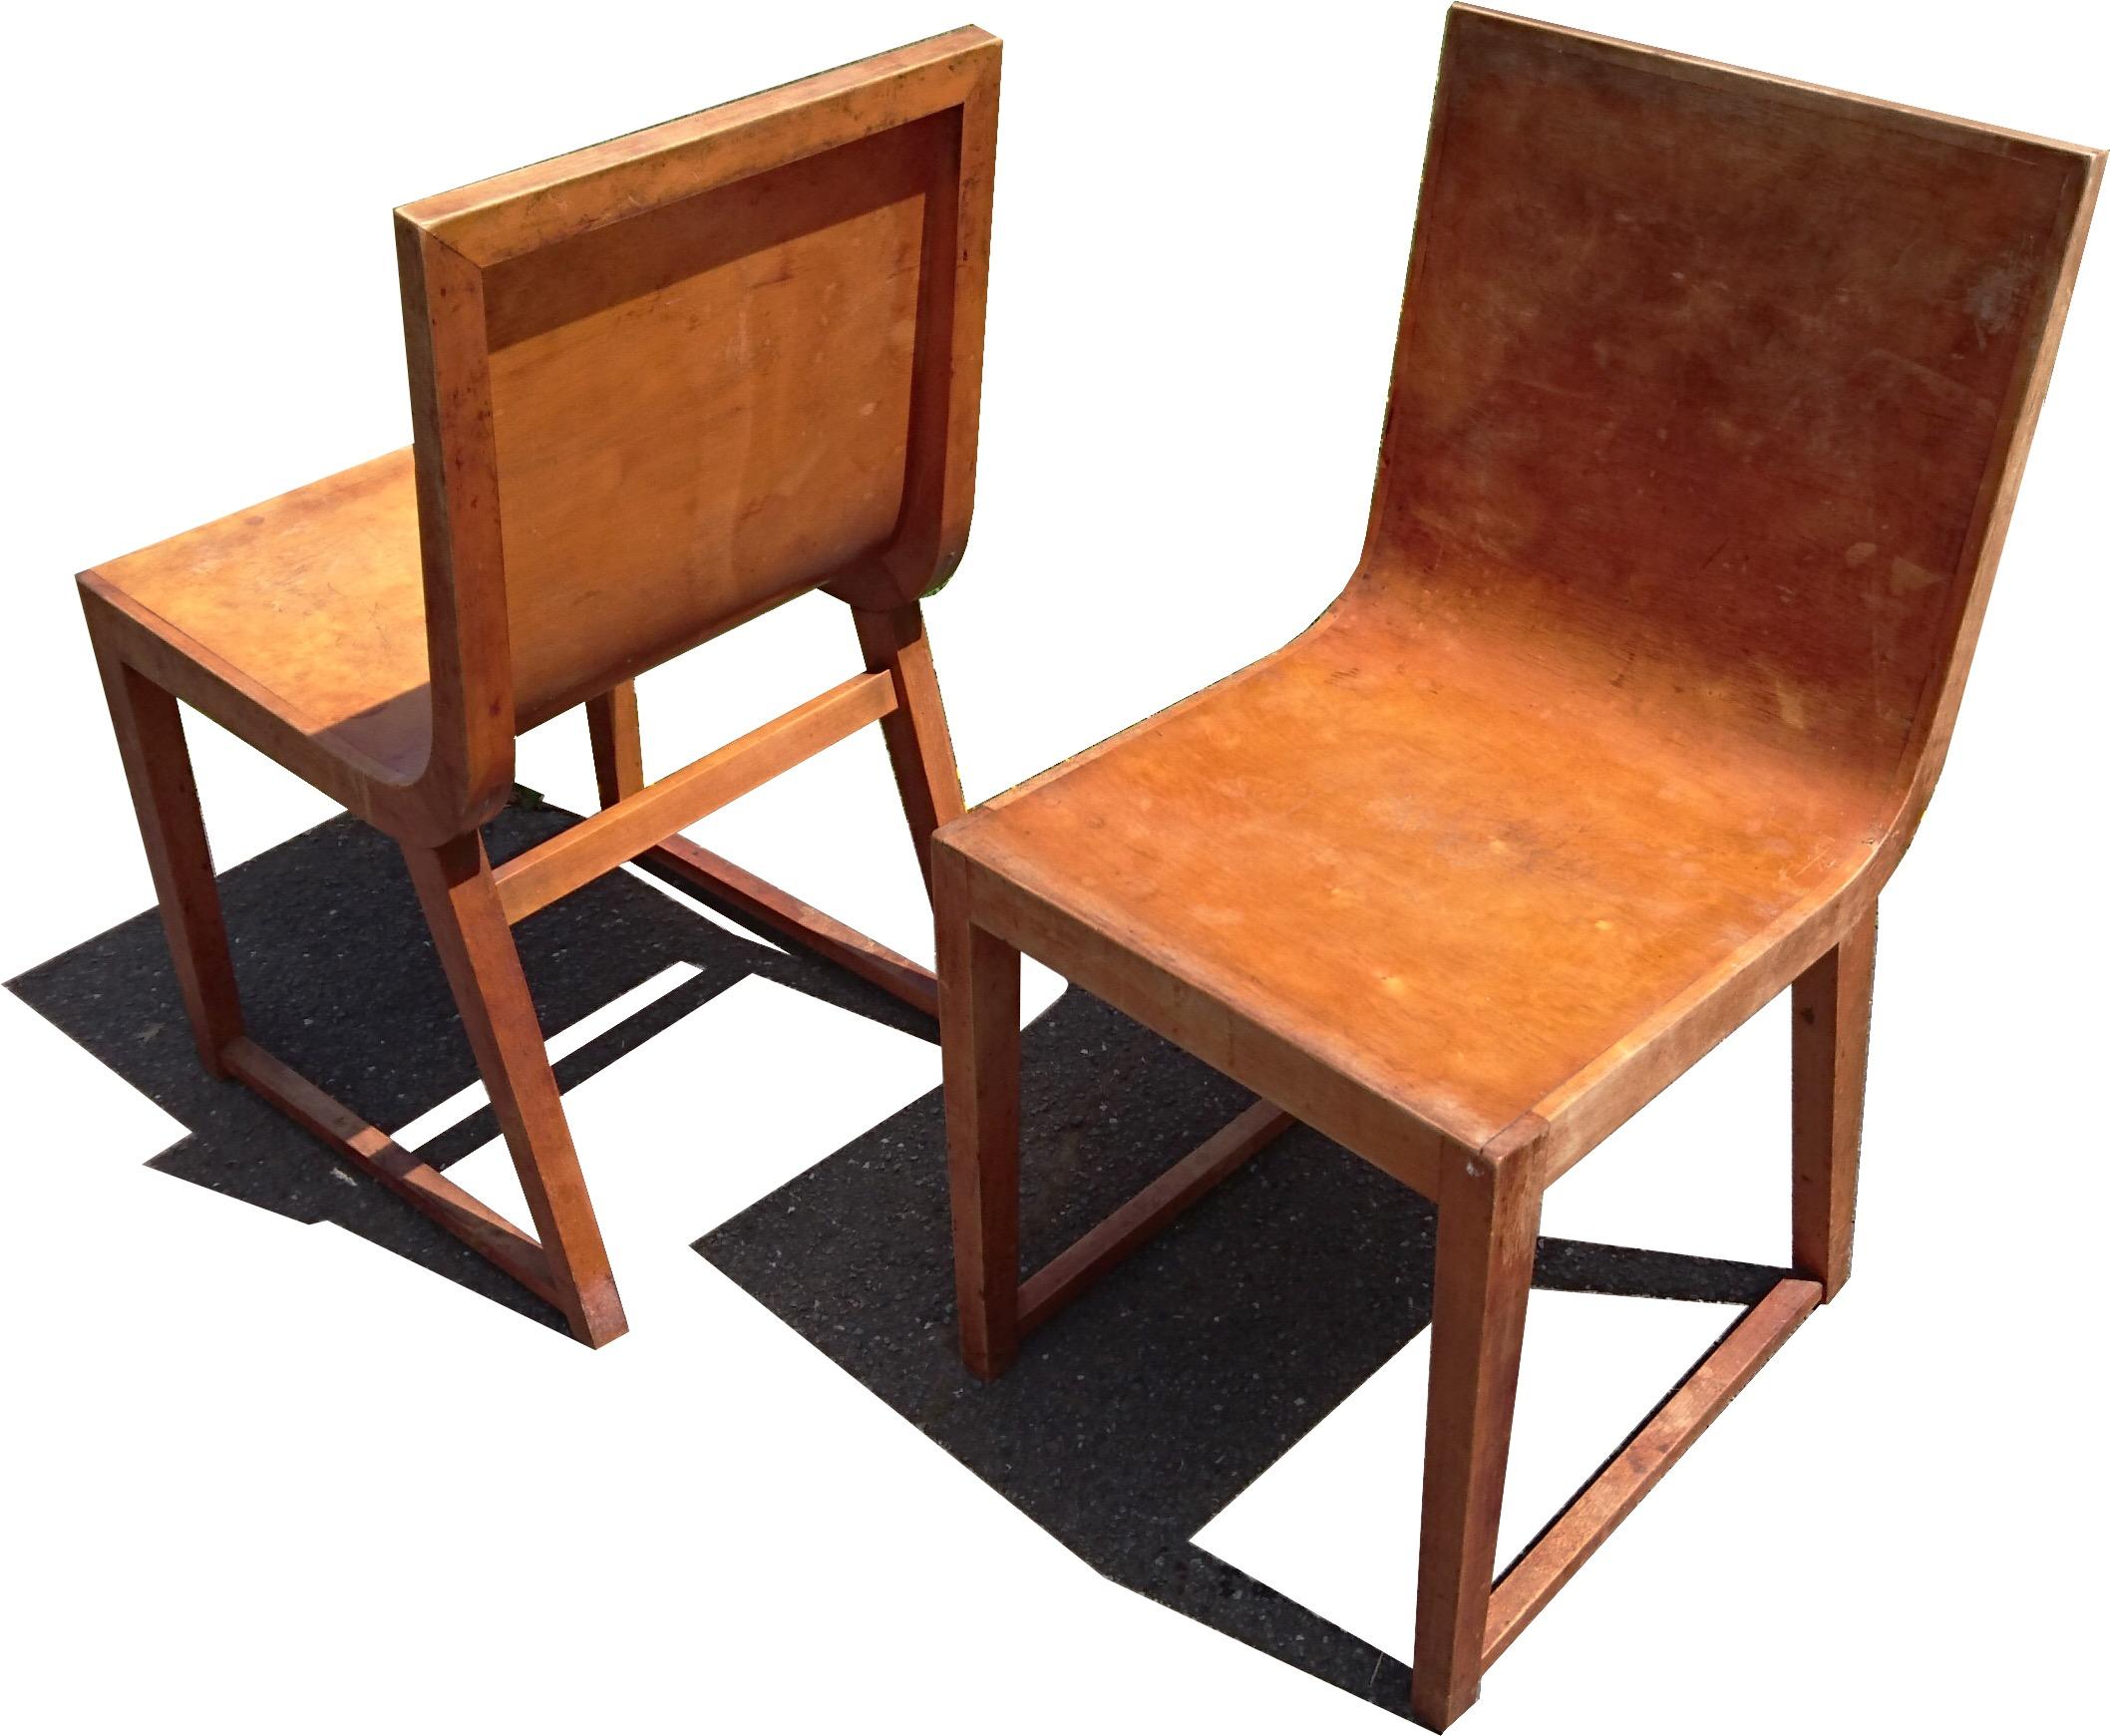 Finnish Modernist Chairs